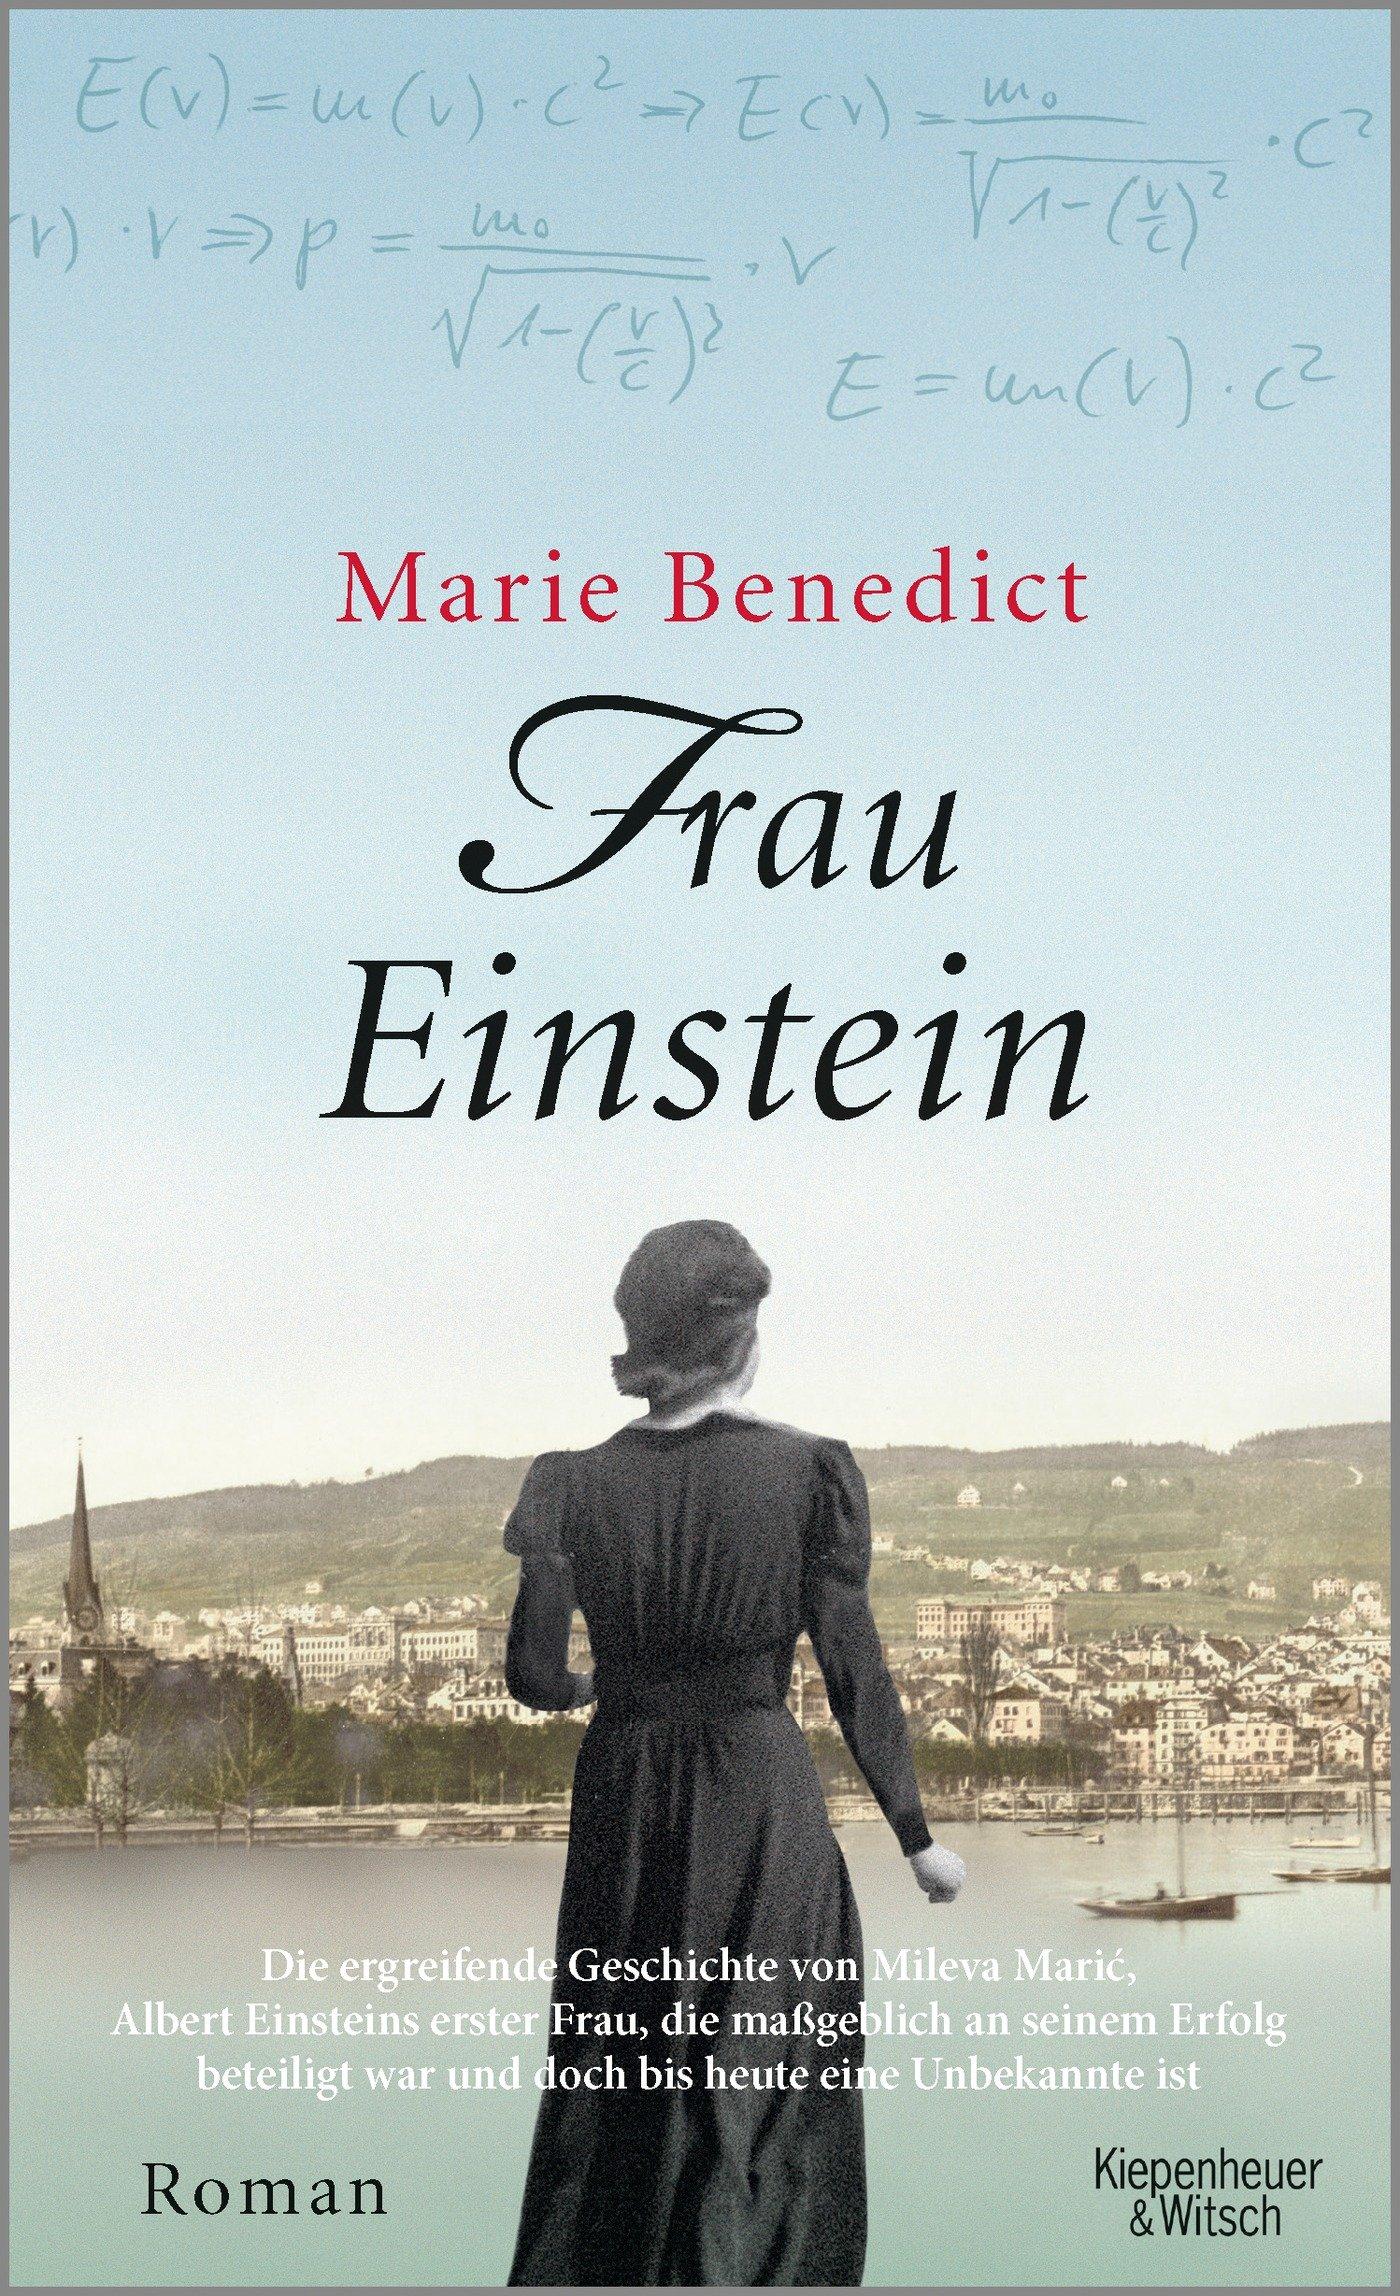 Frau Einstein: Roman Gebundenes Buch – 15. Februar 2018 Marie Benedict Marieke Heimburger Kiepenheuer&Witsch 346204981X